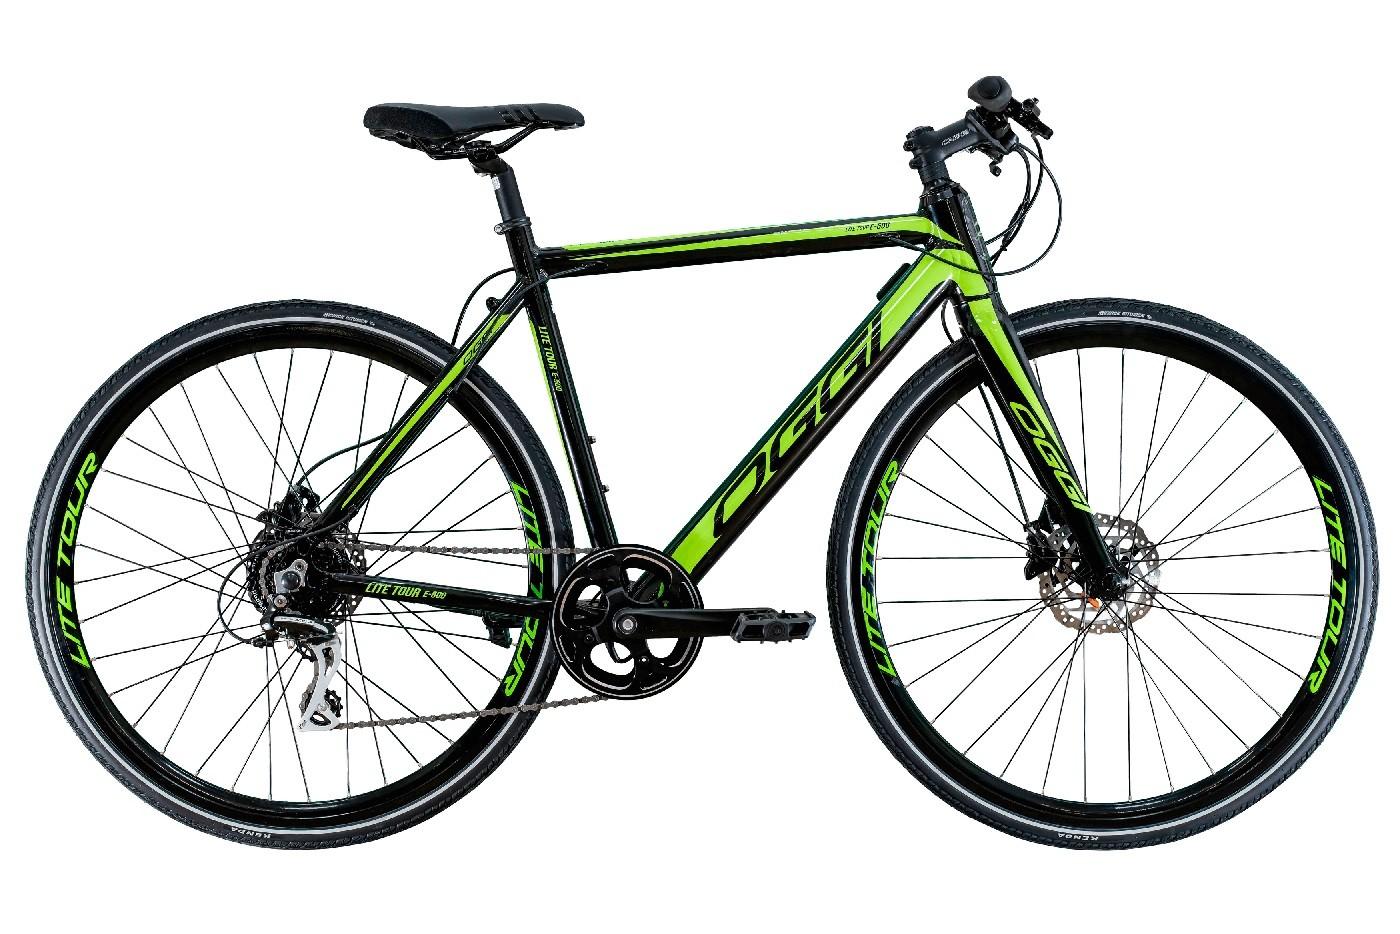 Bicicleta Oggi - E-Bike Lite Tour E-500 - 2020 - Preta / Verde